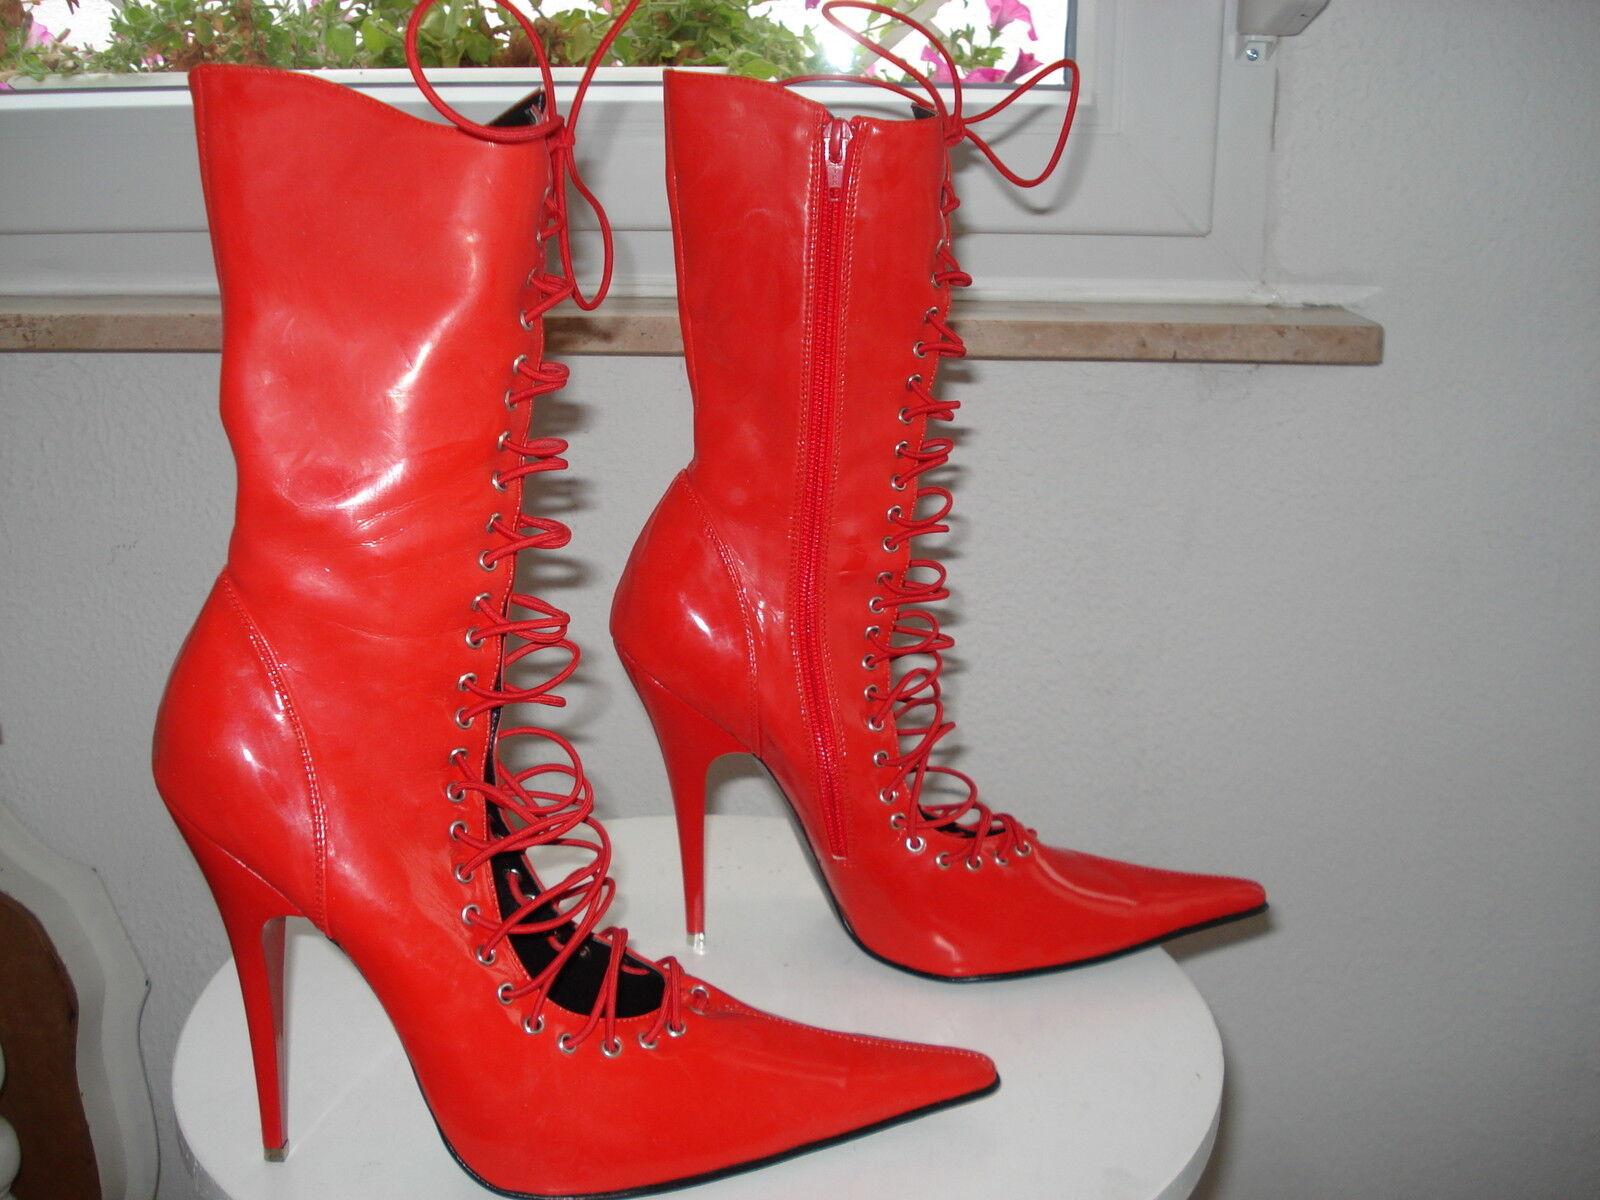 High Heel Stiefelette Stiefelette Stiefelette   Gr. 42 Ledapol Rot lack Metallbeschlag Absatz f80e33